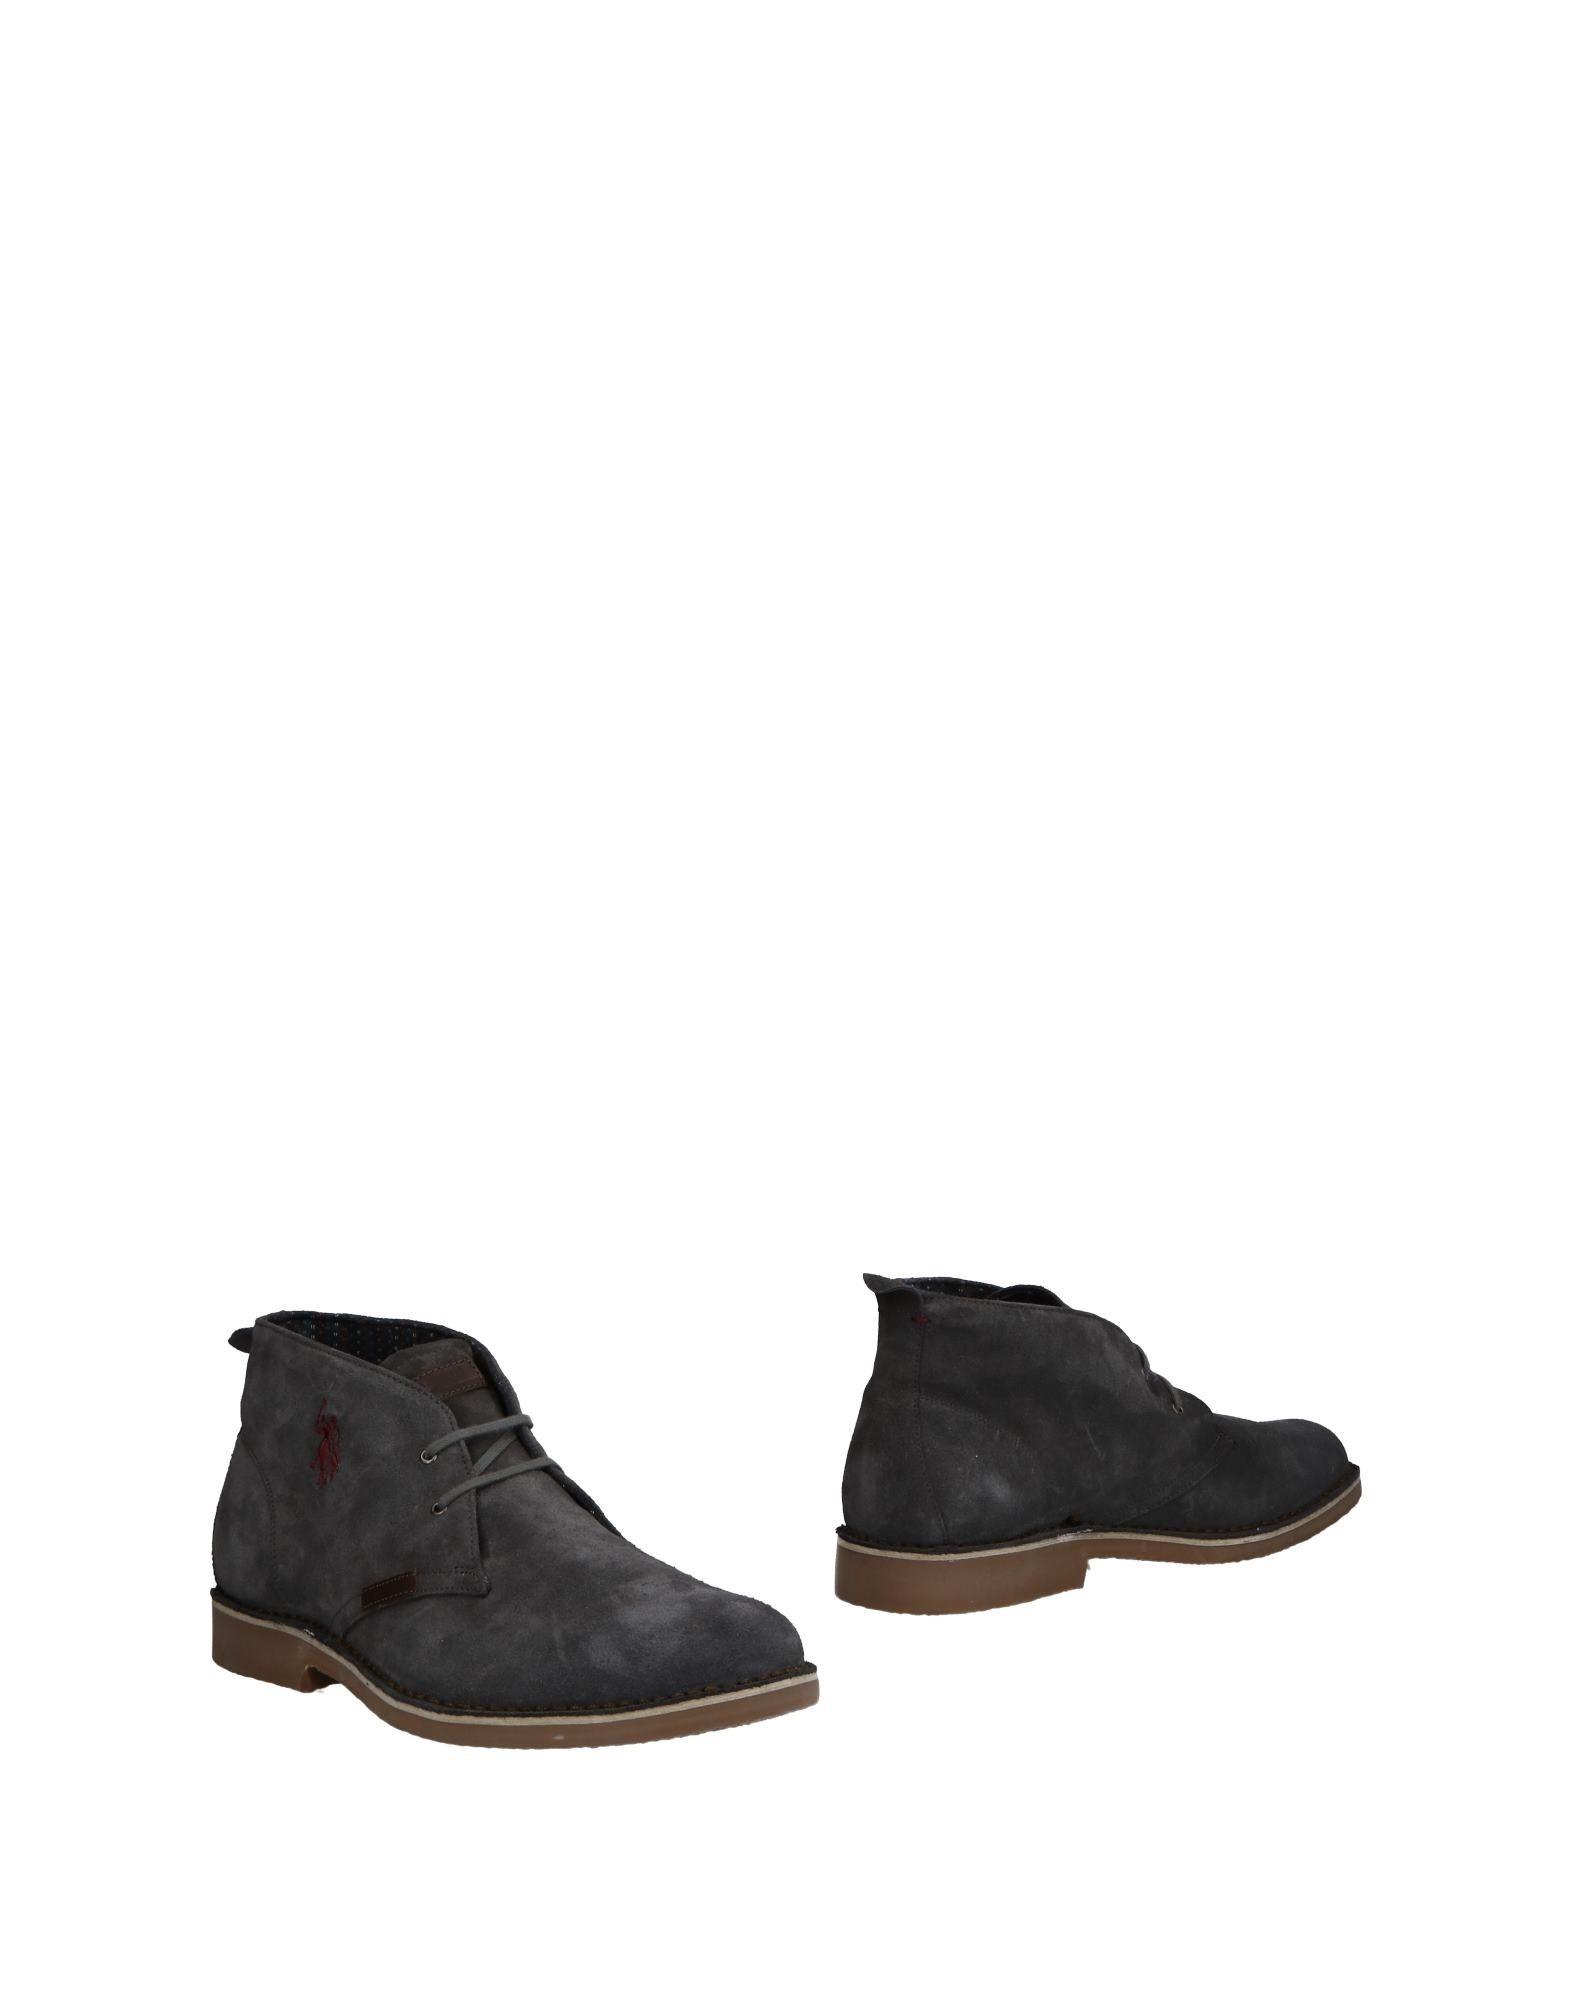 U.S.Polo U.S.Polo Assn. Boots - Men U.S.Polo U.S.Polo Assn. Boots online on  United Kingdom - 11497095AN 8e2317